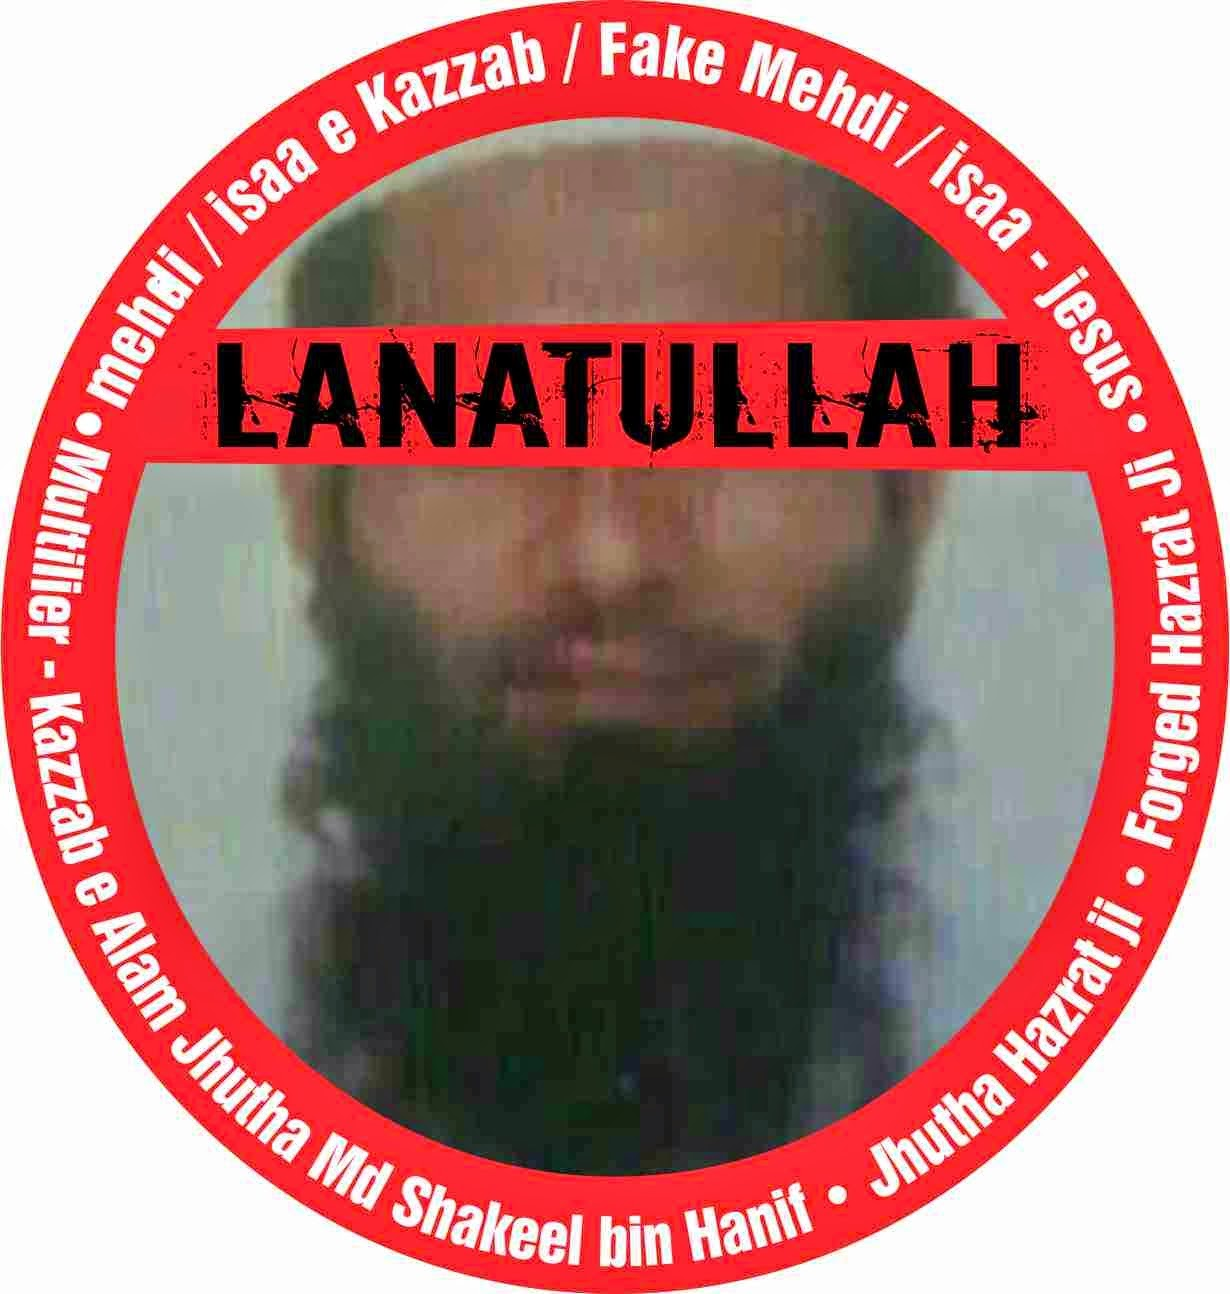 hazrat-ji-md-shakeel-bin-hanif (lanatullah): sabhi posts ki comments